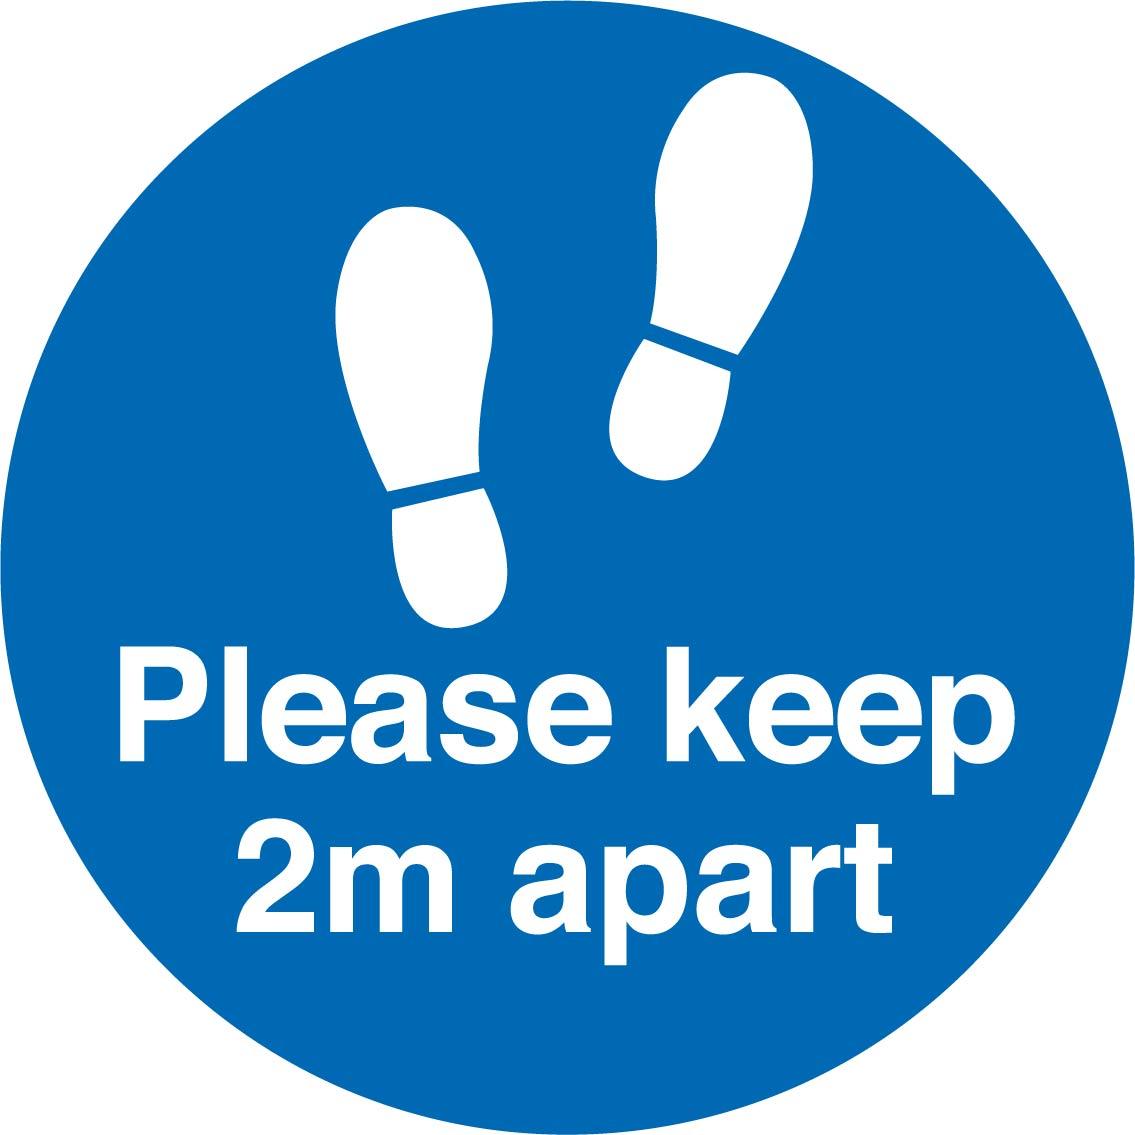 Social Distancing 2m apart footprint